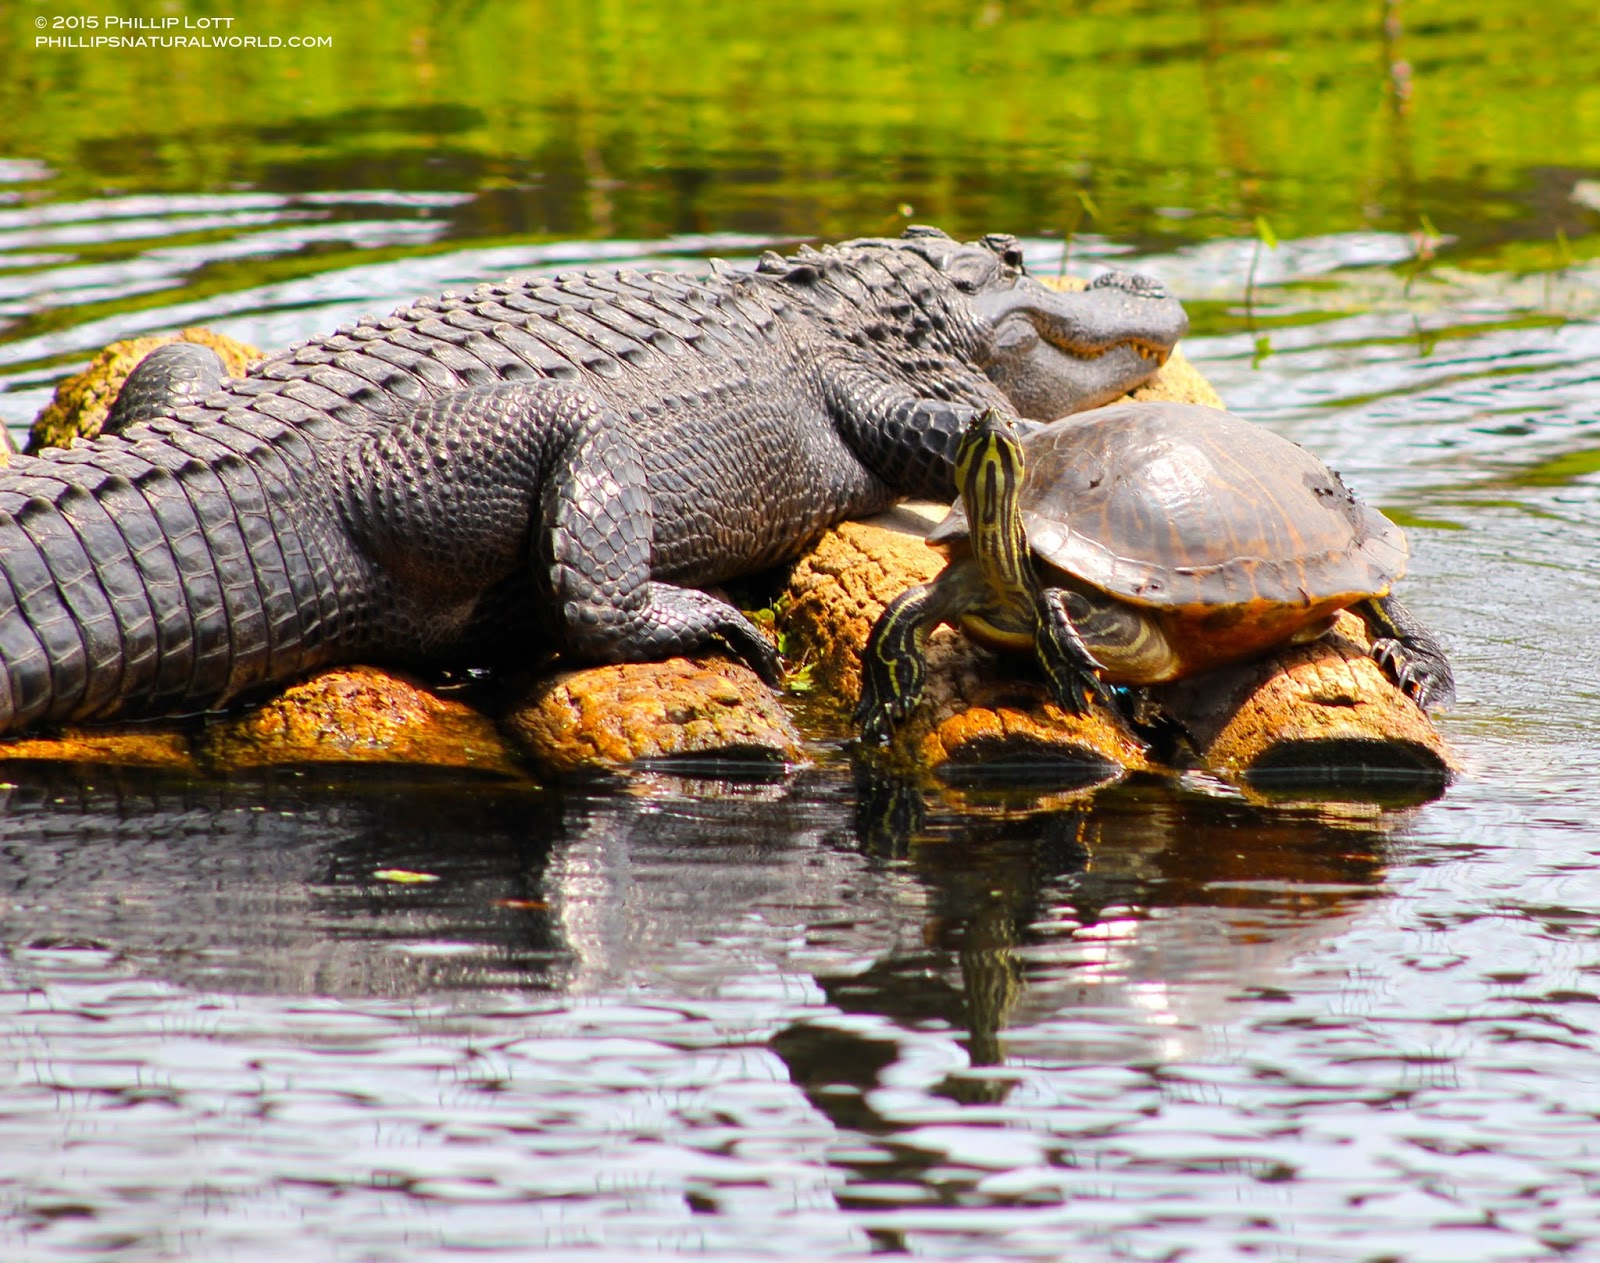 Alligator%2Band%2BYellow bellied%2BSlider%2BHomosassa%2BSprings%2BJune%2B2015%2BCopyright%2BPhillip%2BLott%2Bc alligators, sunflowers, and florida heat phillip's natural world 1 0 2